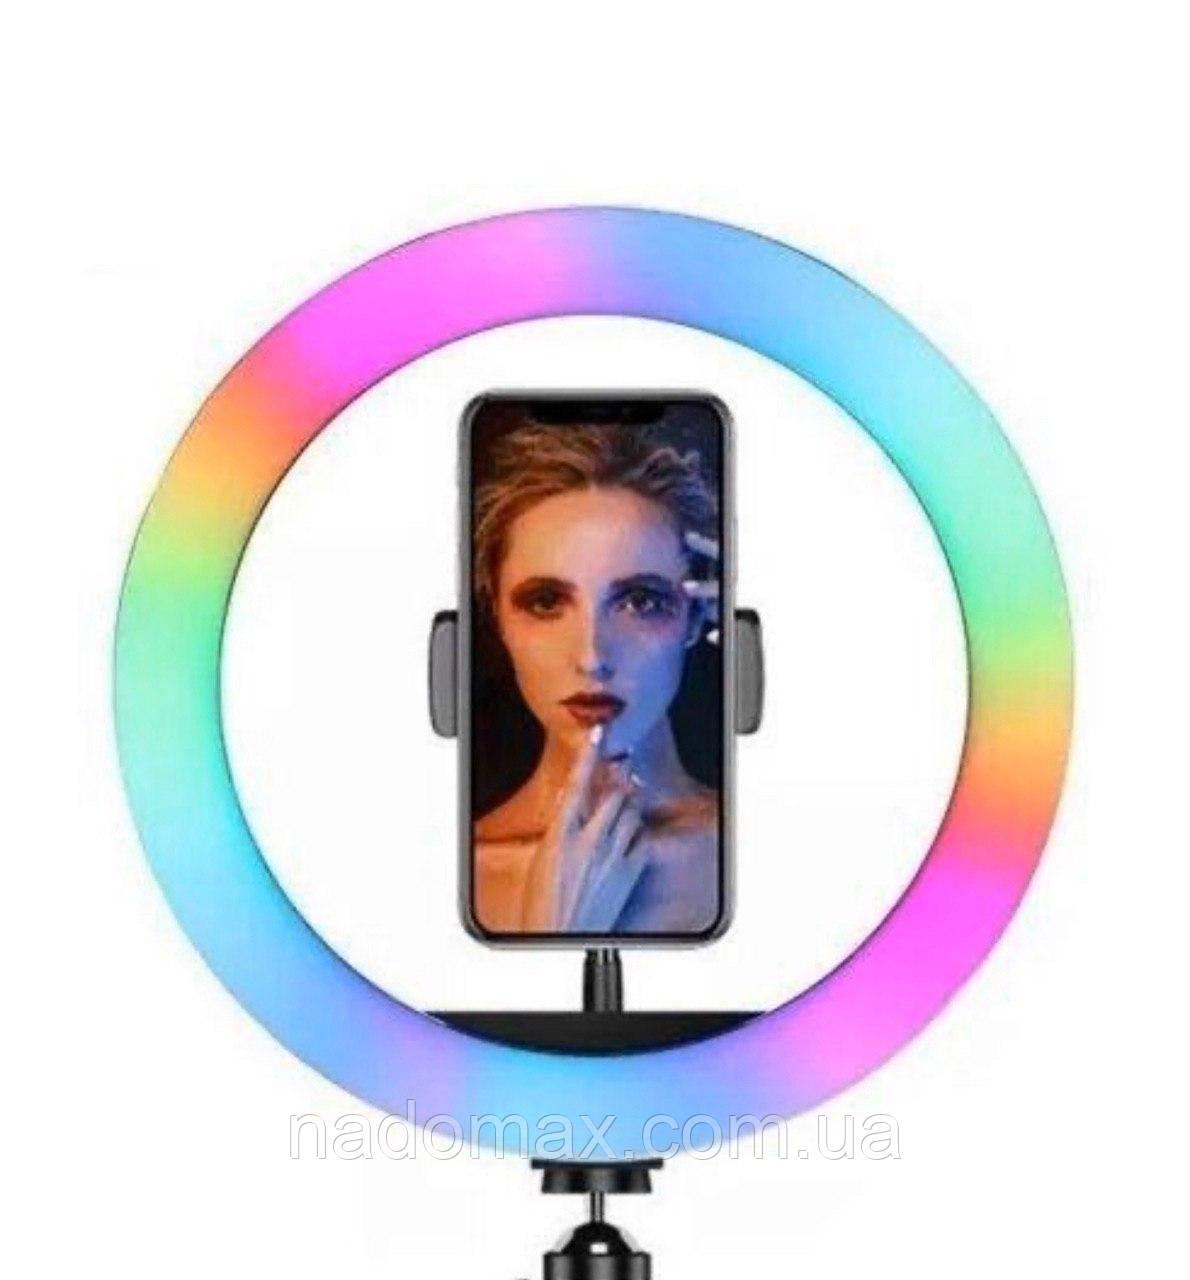 Кольцевая лампа RGB-260 26 см световое кольцо для селфи